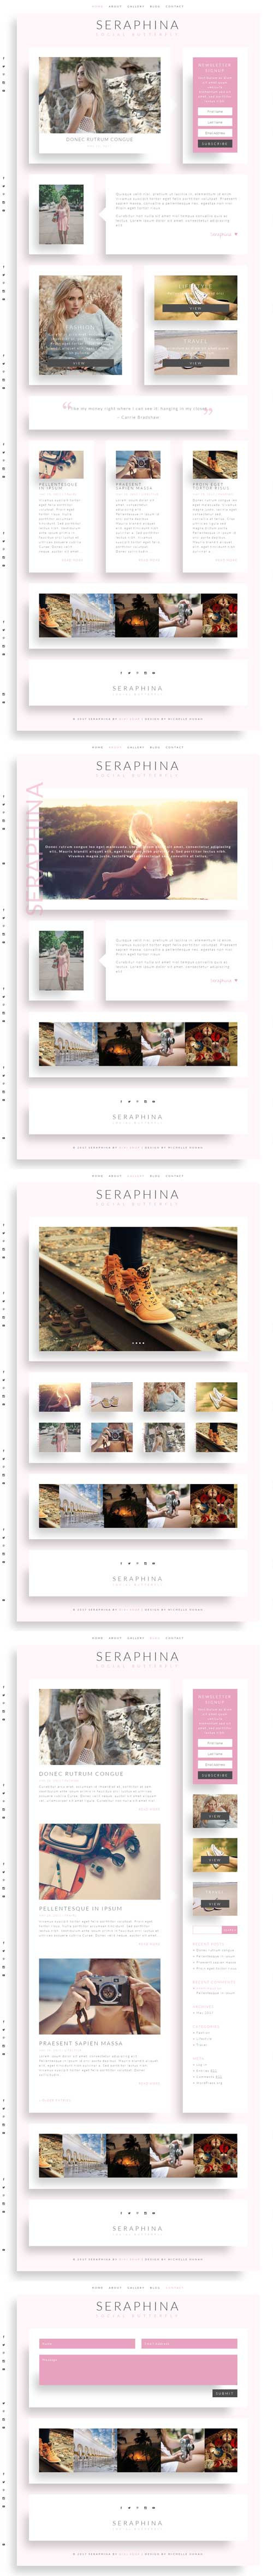 seraphina-divi-layout